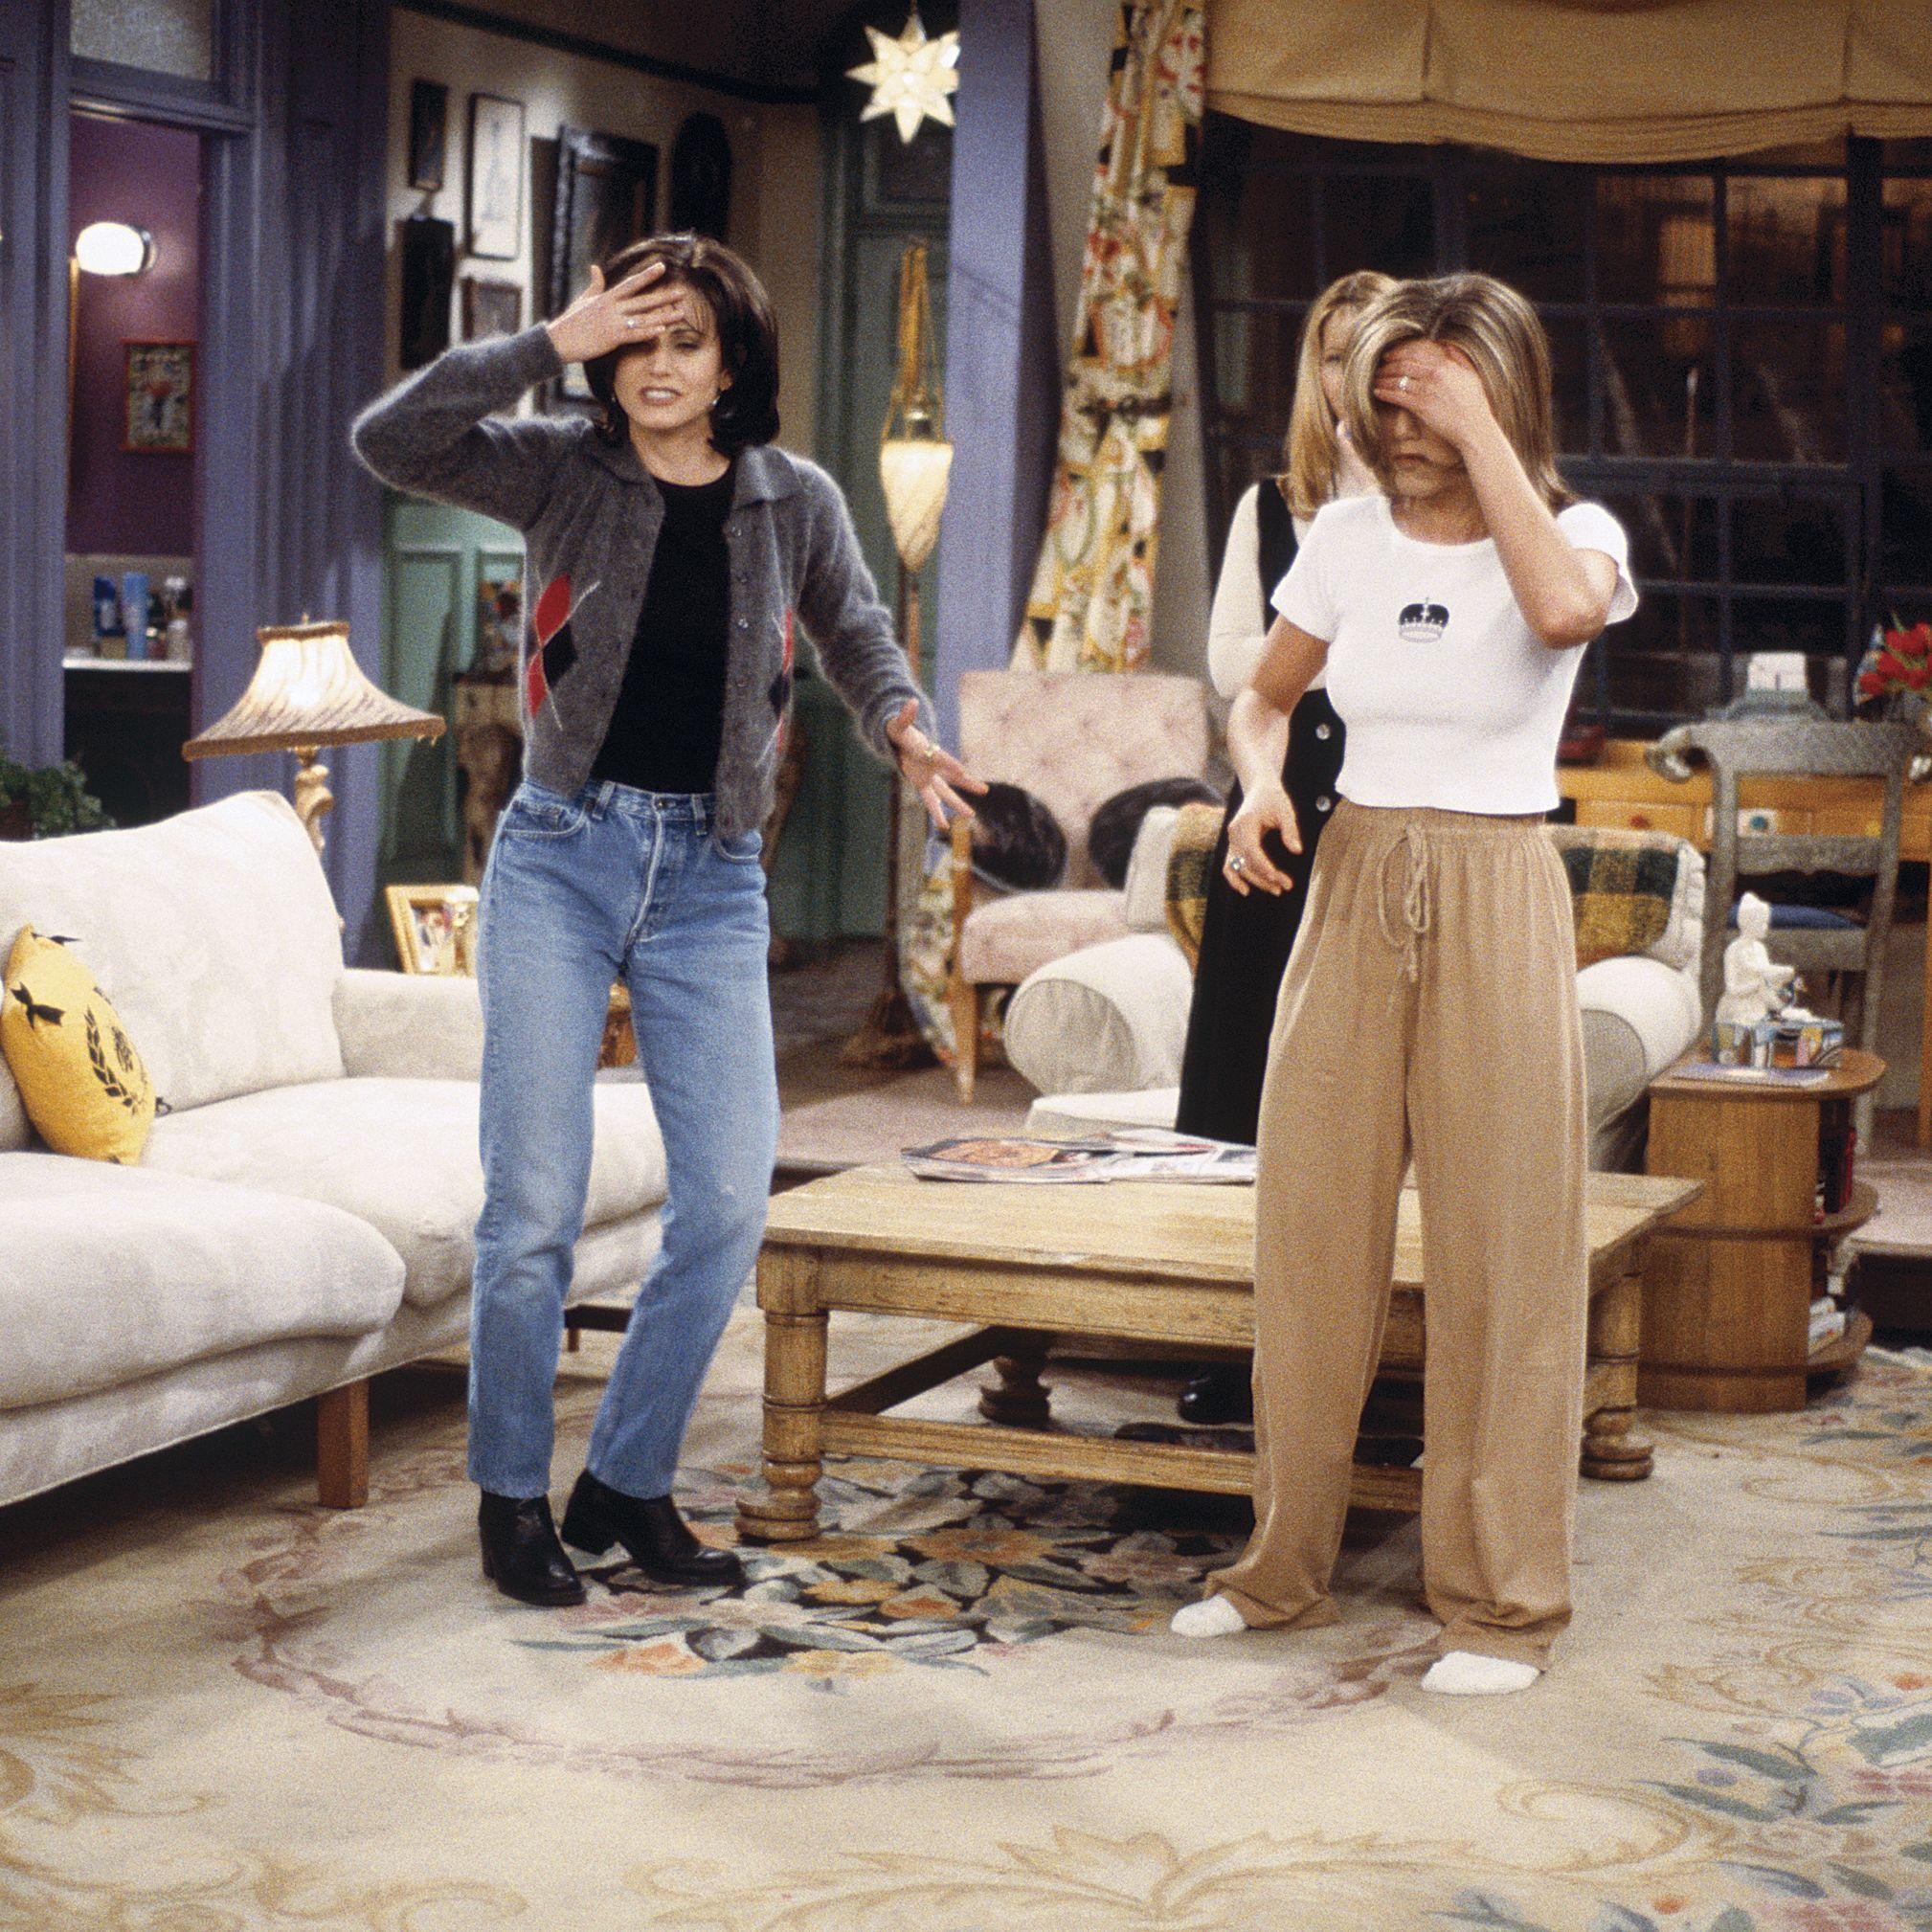 FRIENDS -- &quot&#x3B;The One After the Superbowl&quot&#x3B; (Part 2) Episode 12 -- Pictured: (l-r) Courteney Cox Arquette as Monica Geller, Jennifer Aniston as Rachel Green -- Photo by: J. Delvalle/NBCU Photo Bank